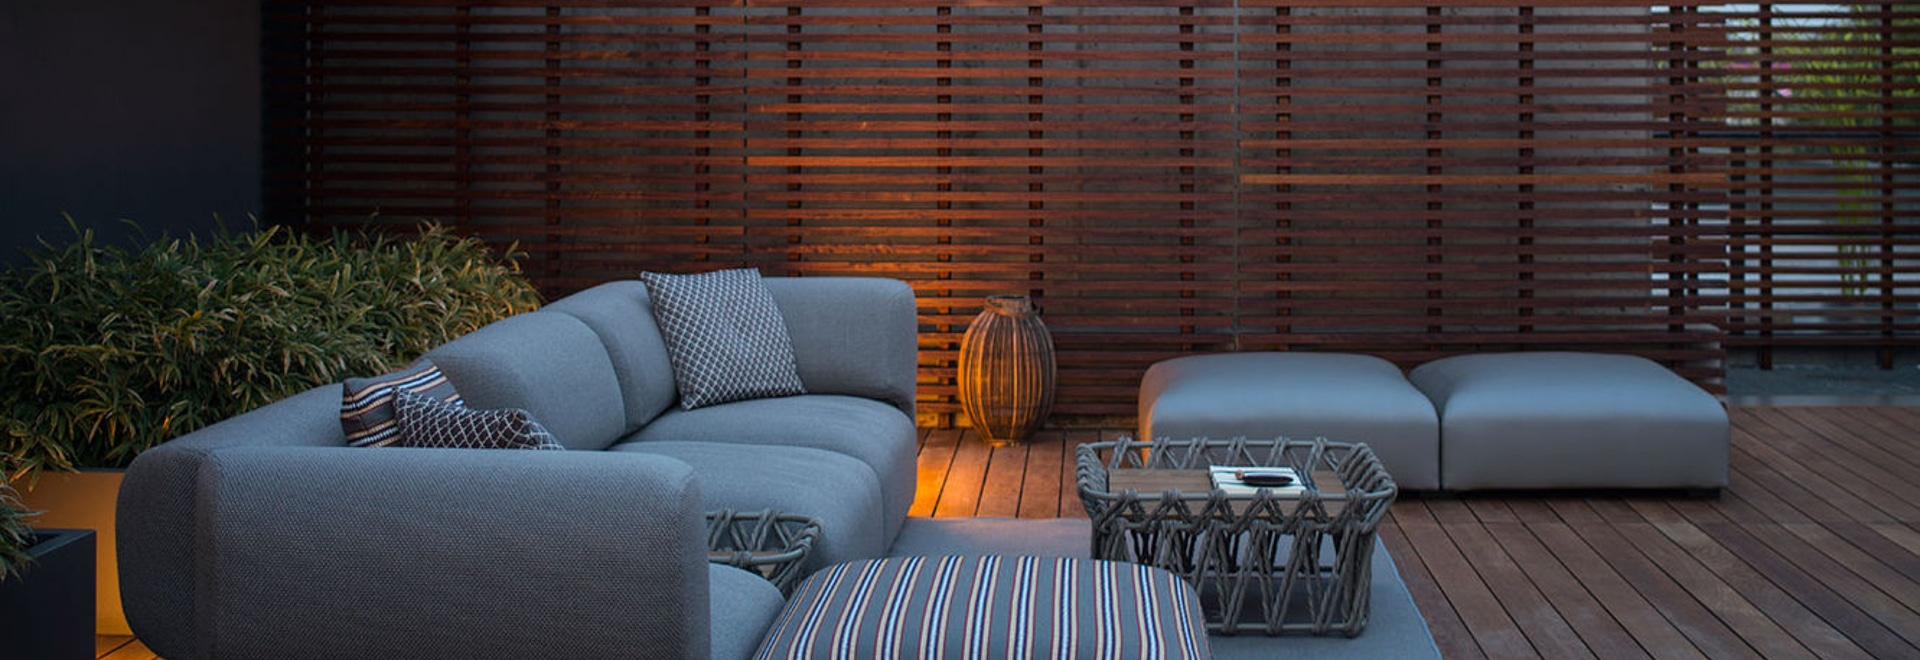 NUEVO: sofá modular por B&B Italia